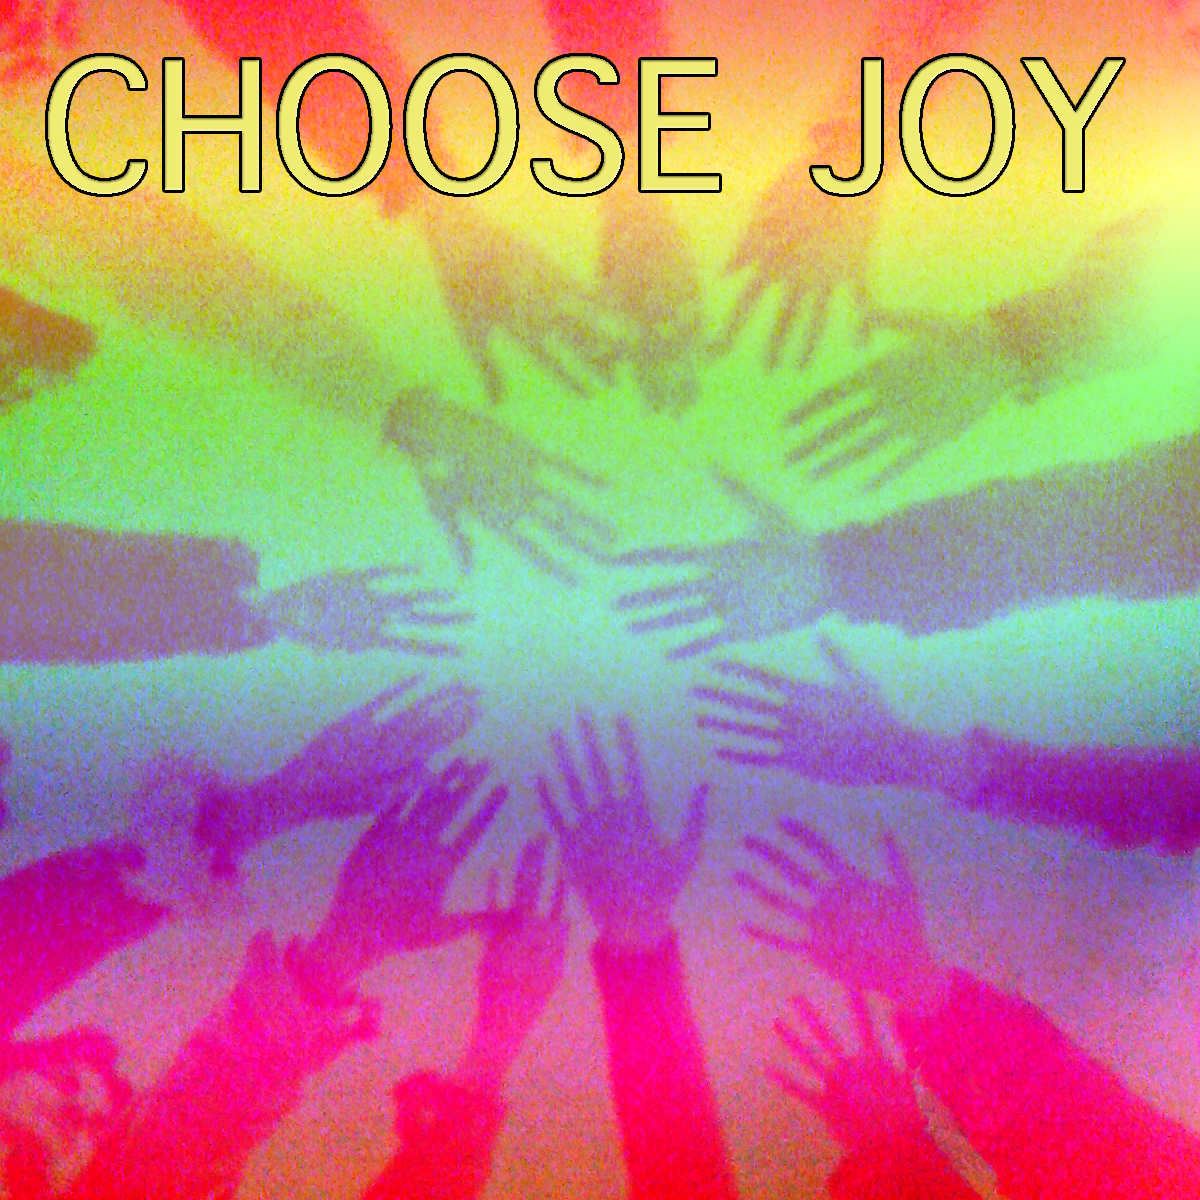 choosejoy.jpg